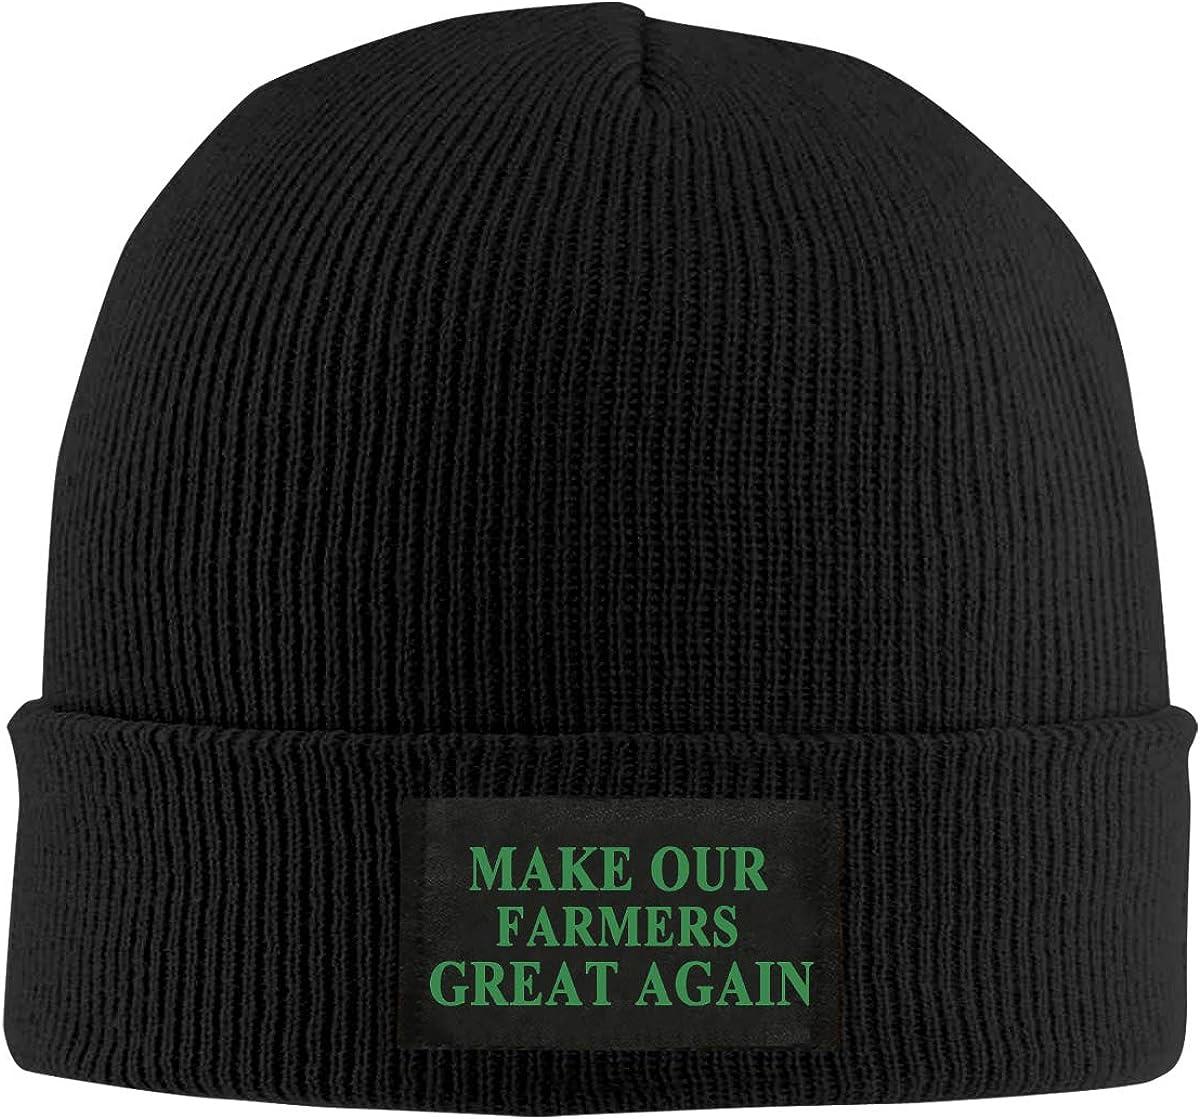 Make Our Farmers Great Again Unisex Warm Winter Hat Knit Beanie Skull Cap Cuff Beanie Hat Winter Hats